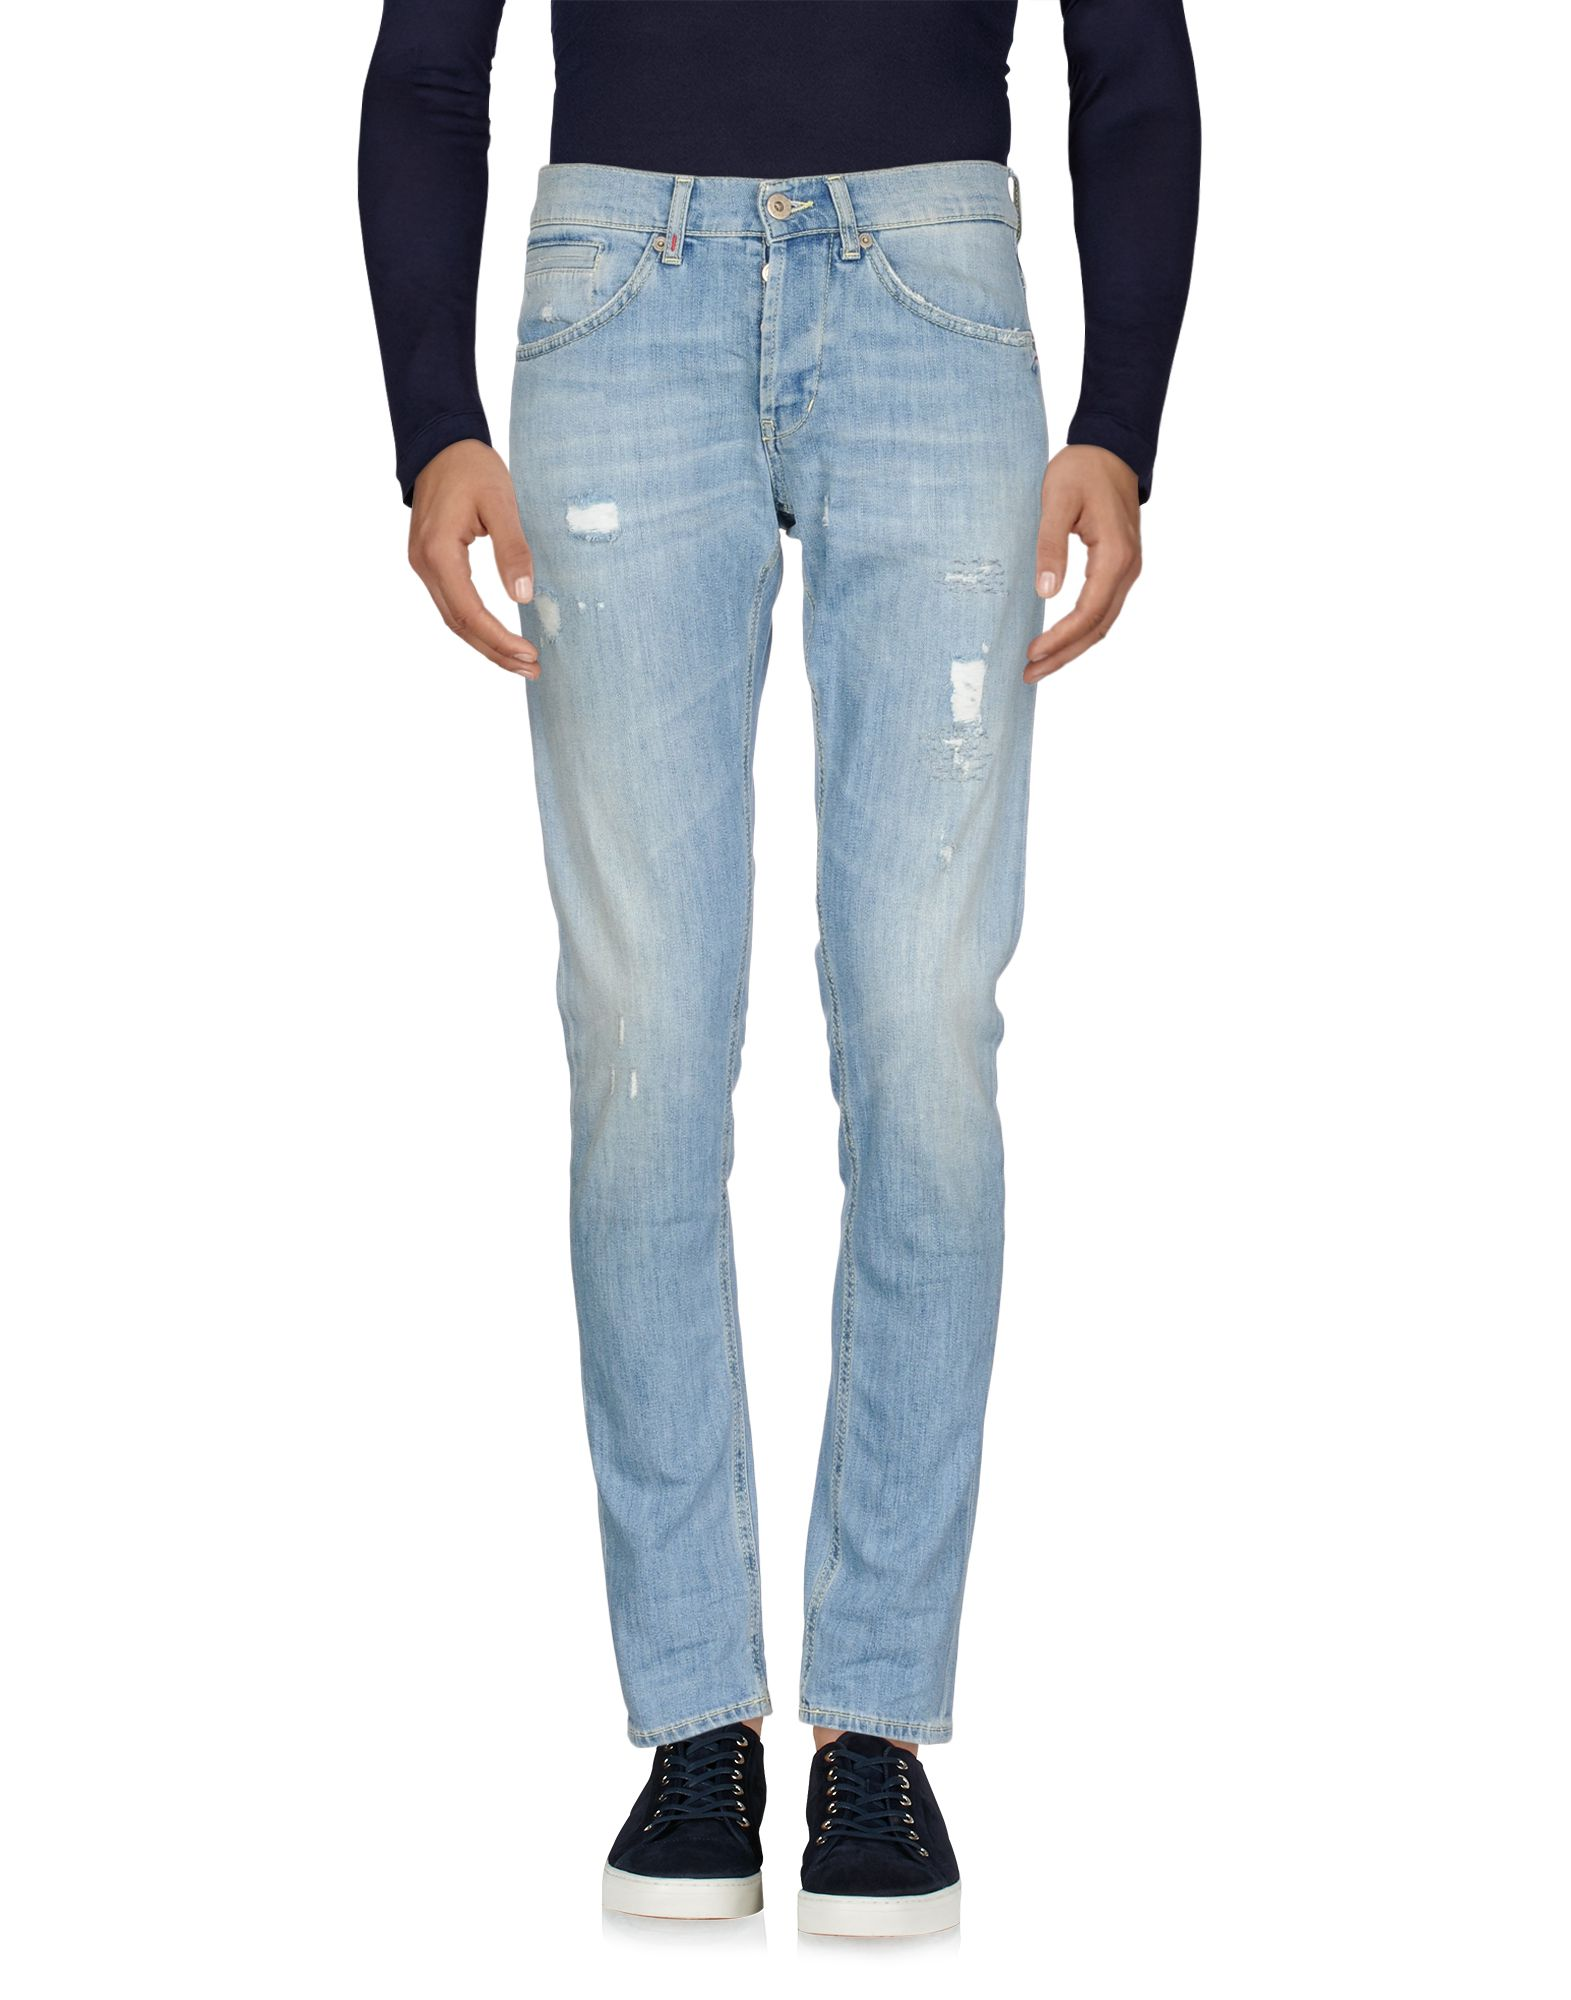 Pantaloni Jeans Dondup - Uomo - Dondup 42673921VE db67ff